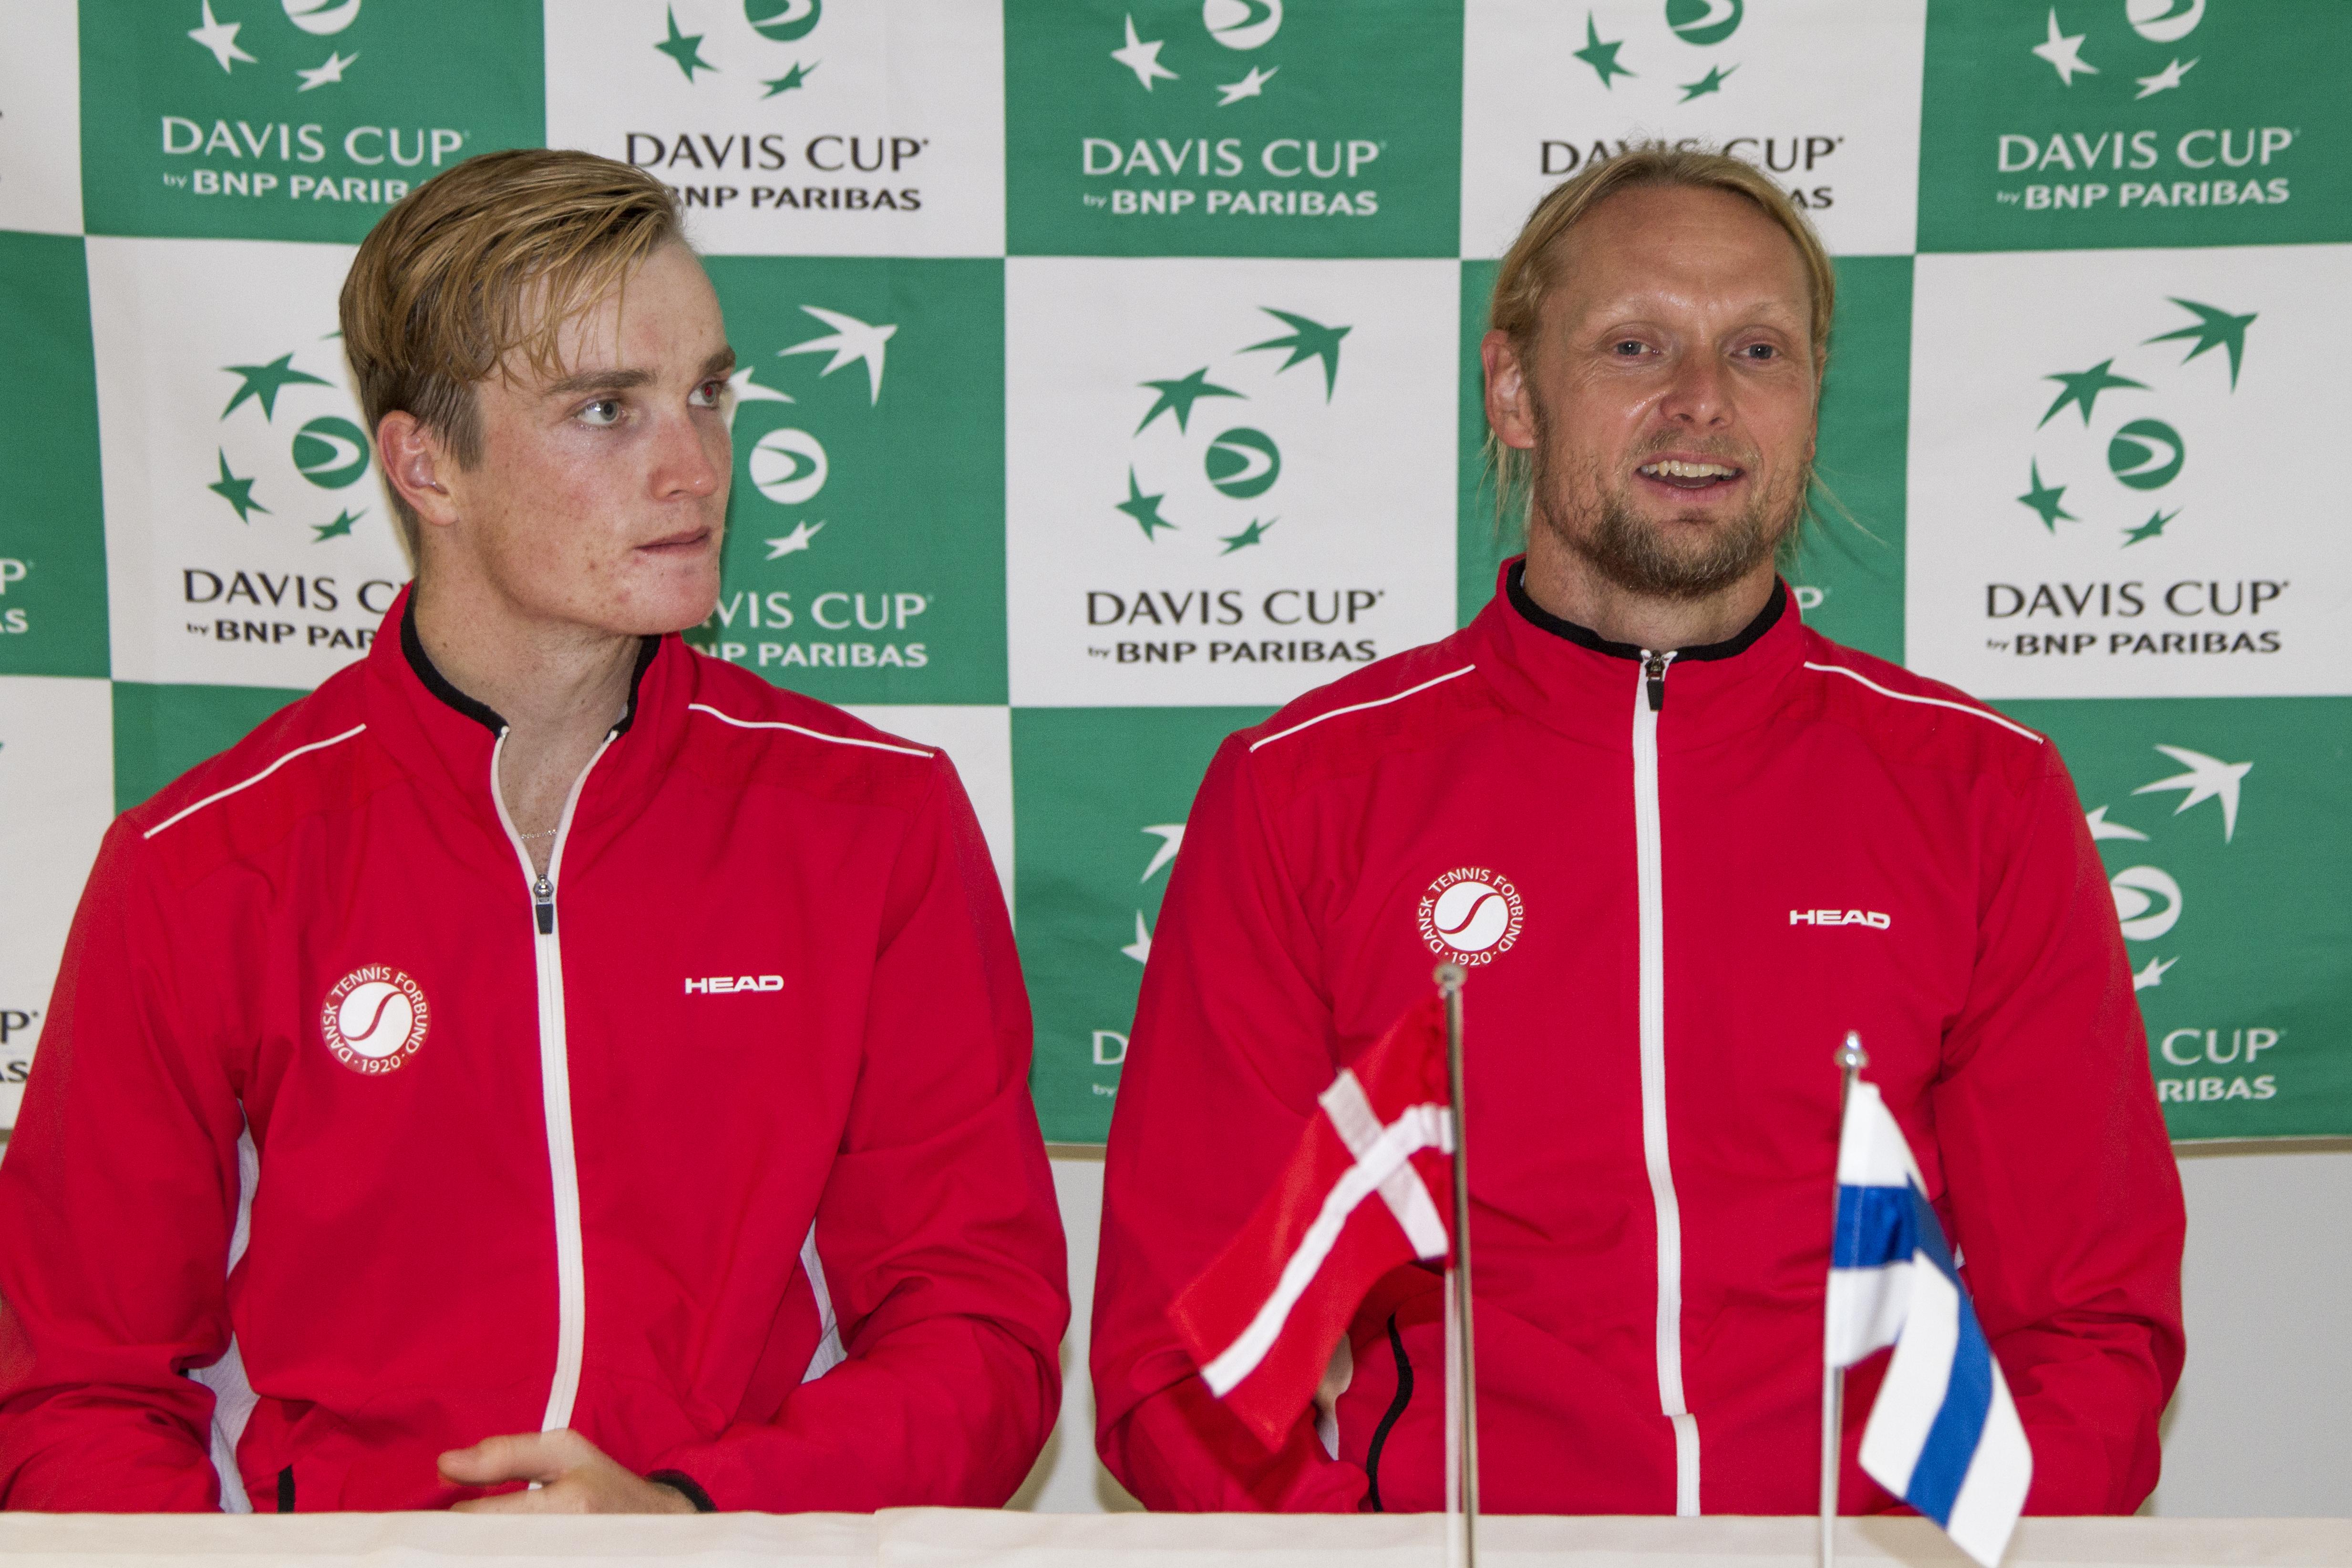 Mikael Torpegaard, Kenneth Carlsen